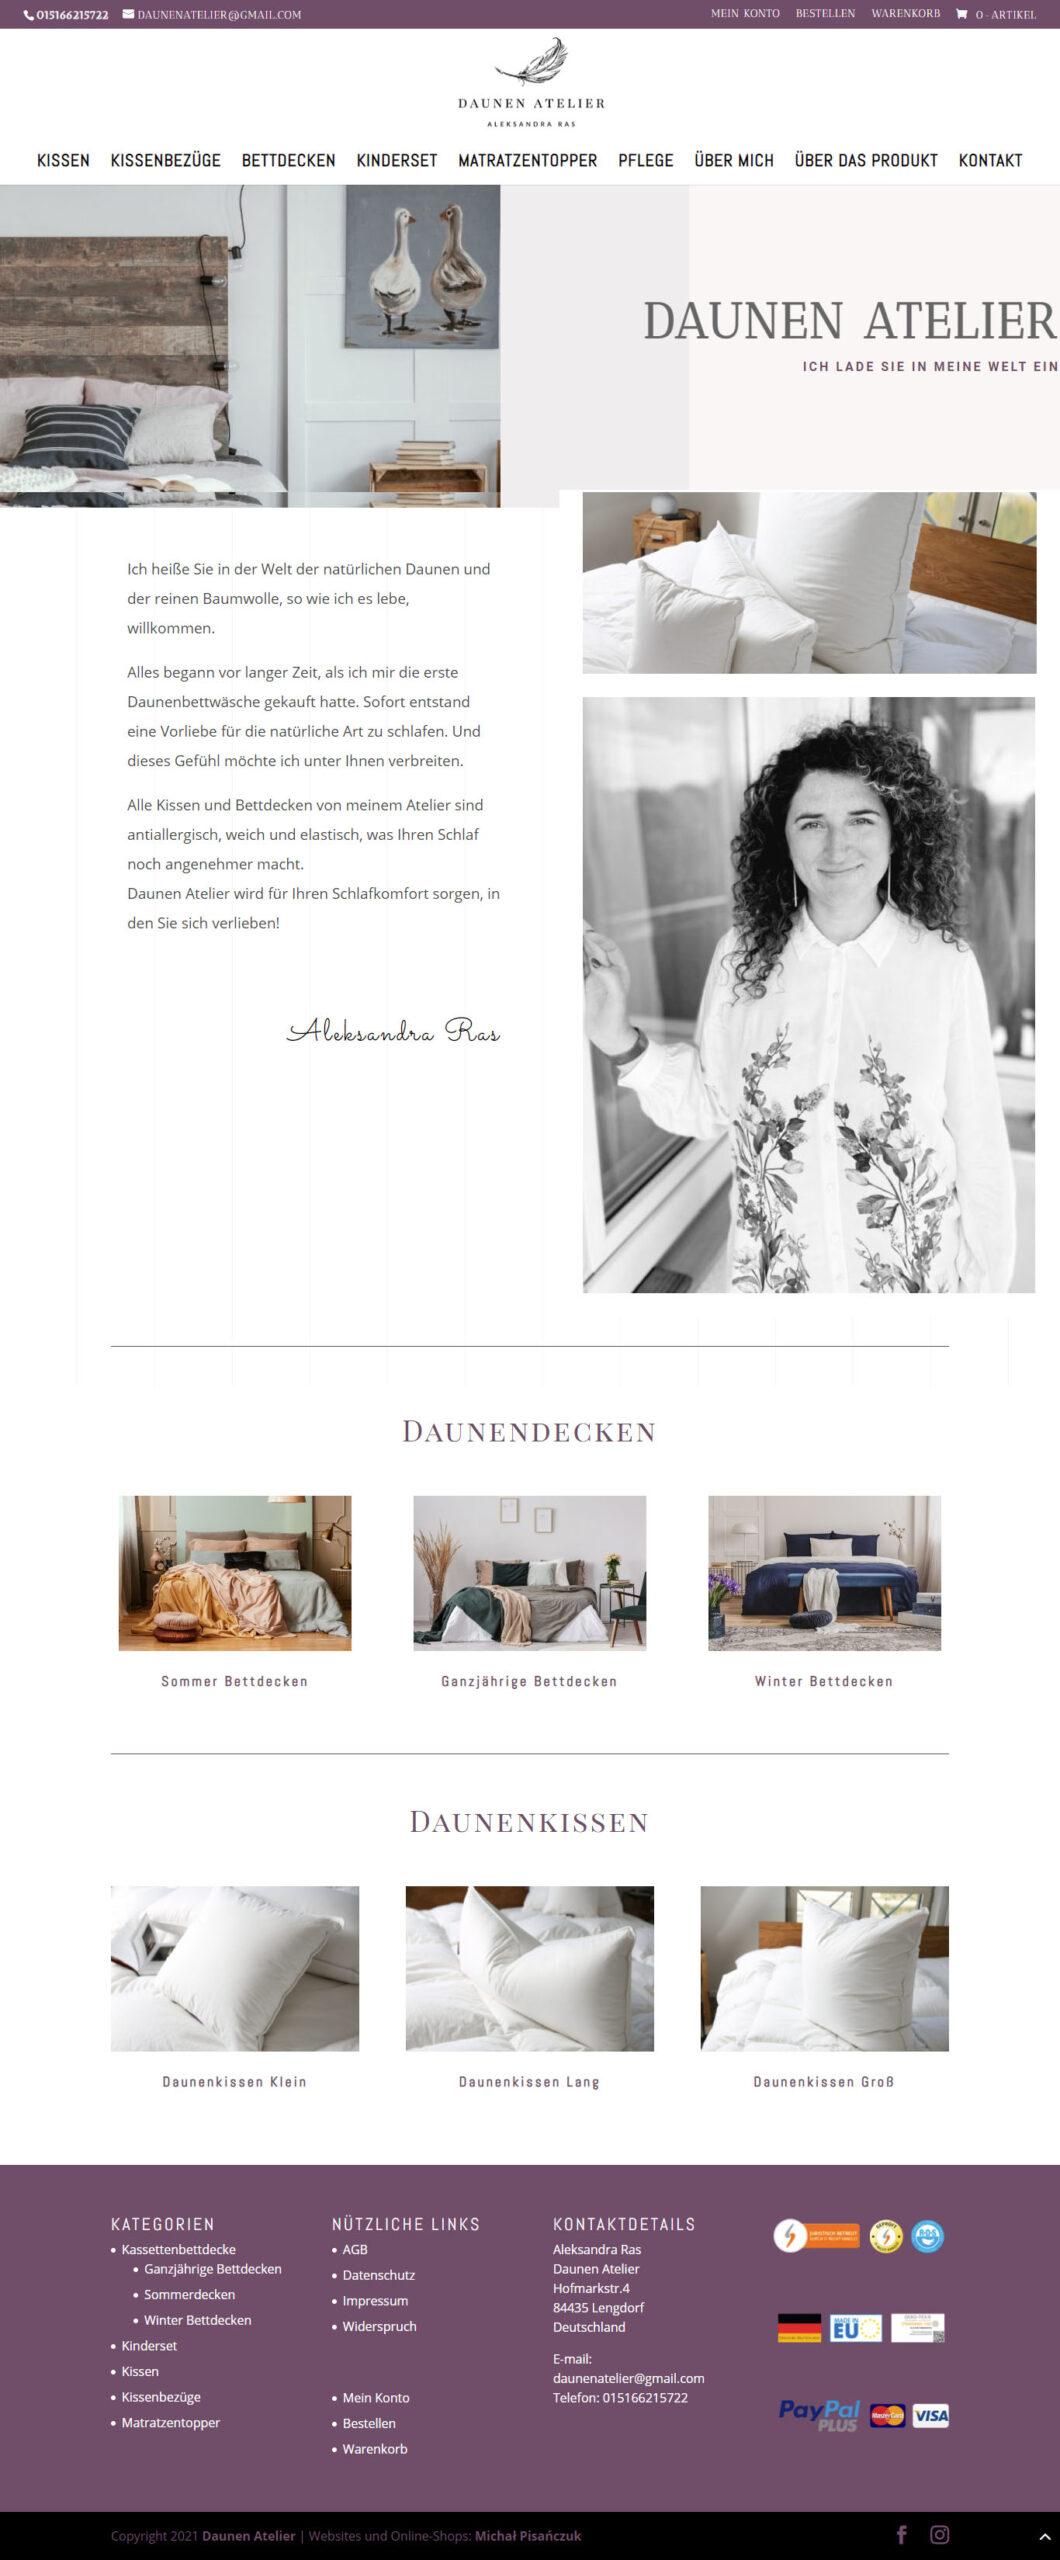 Daunen Atelier – Sklep internetowy